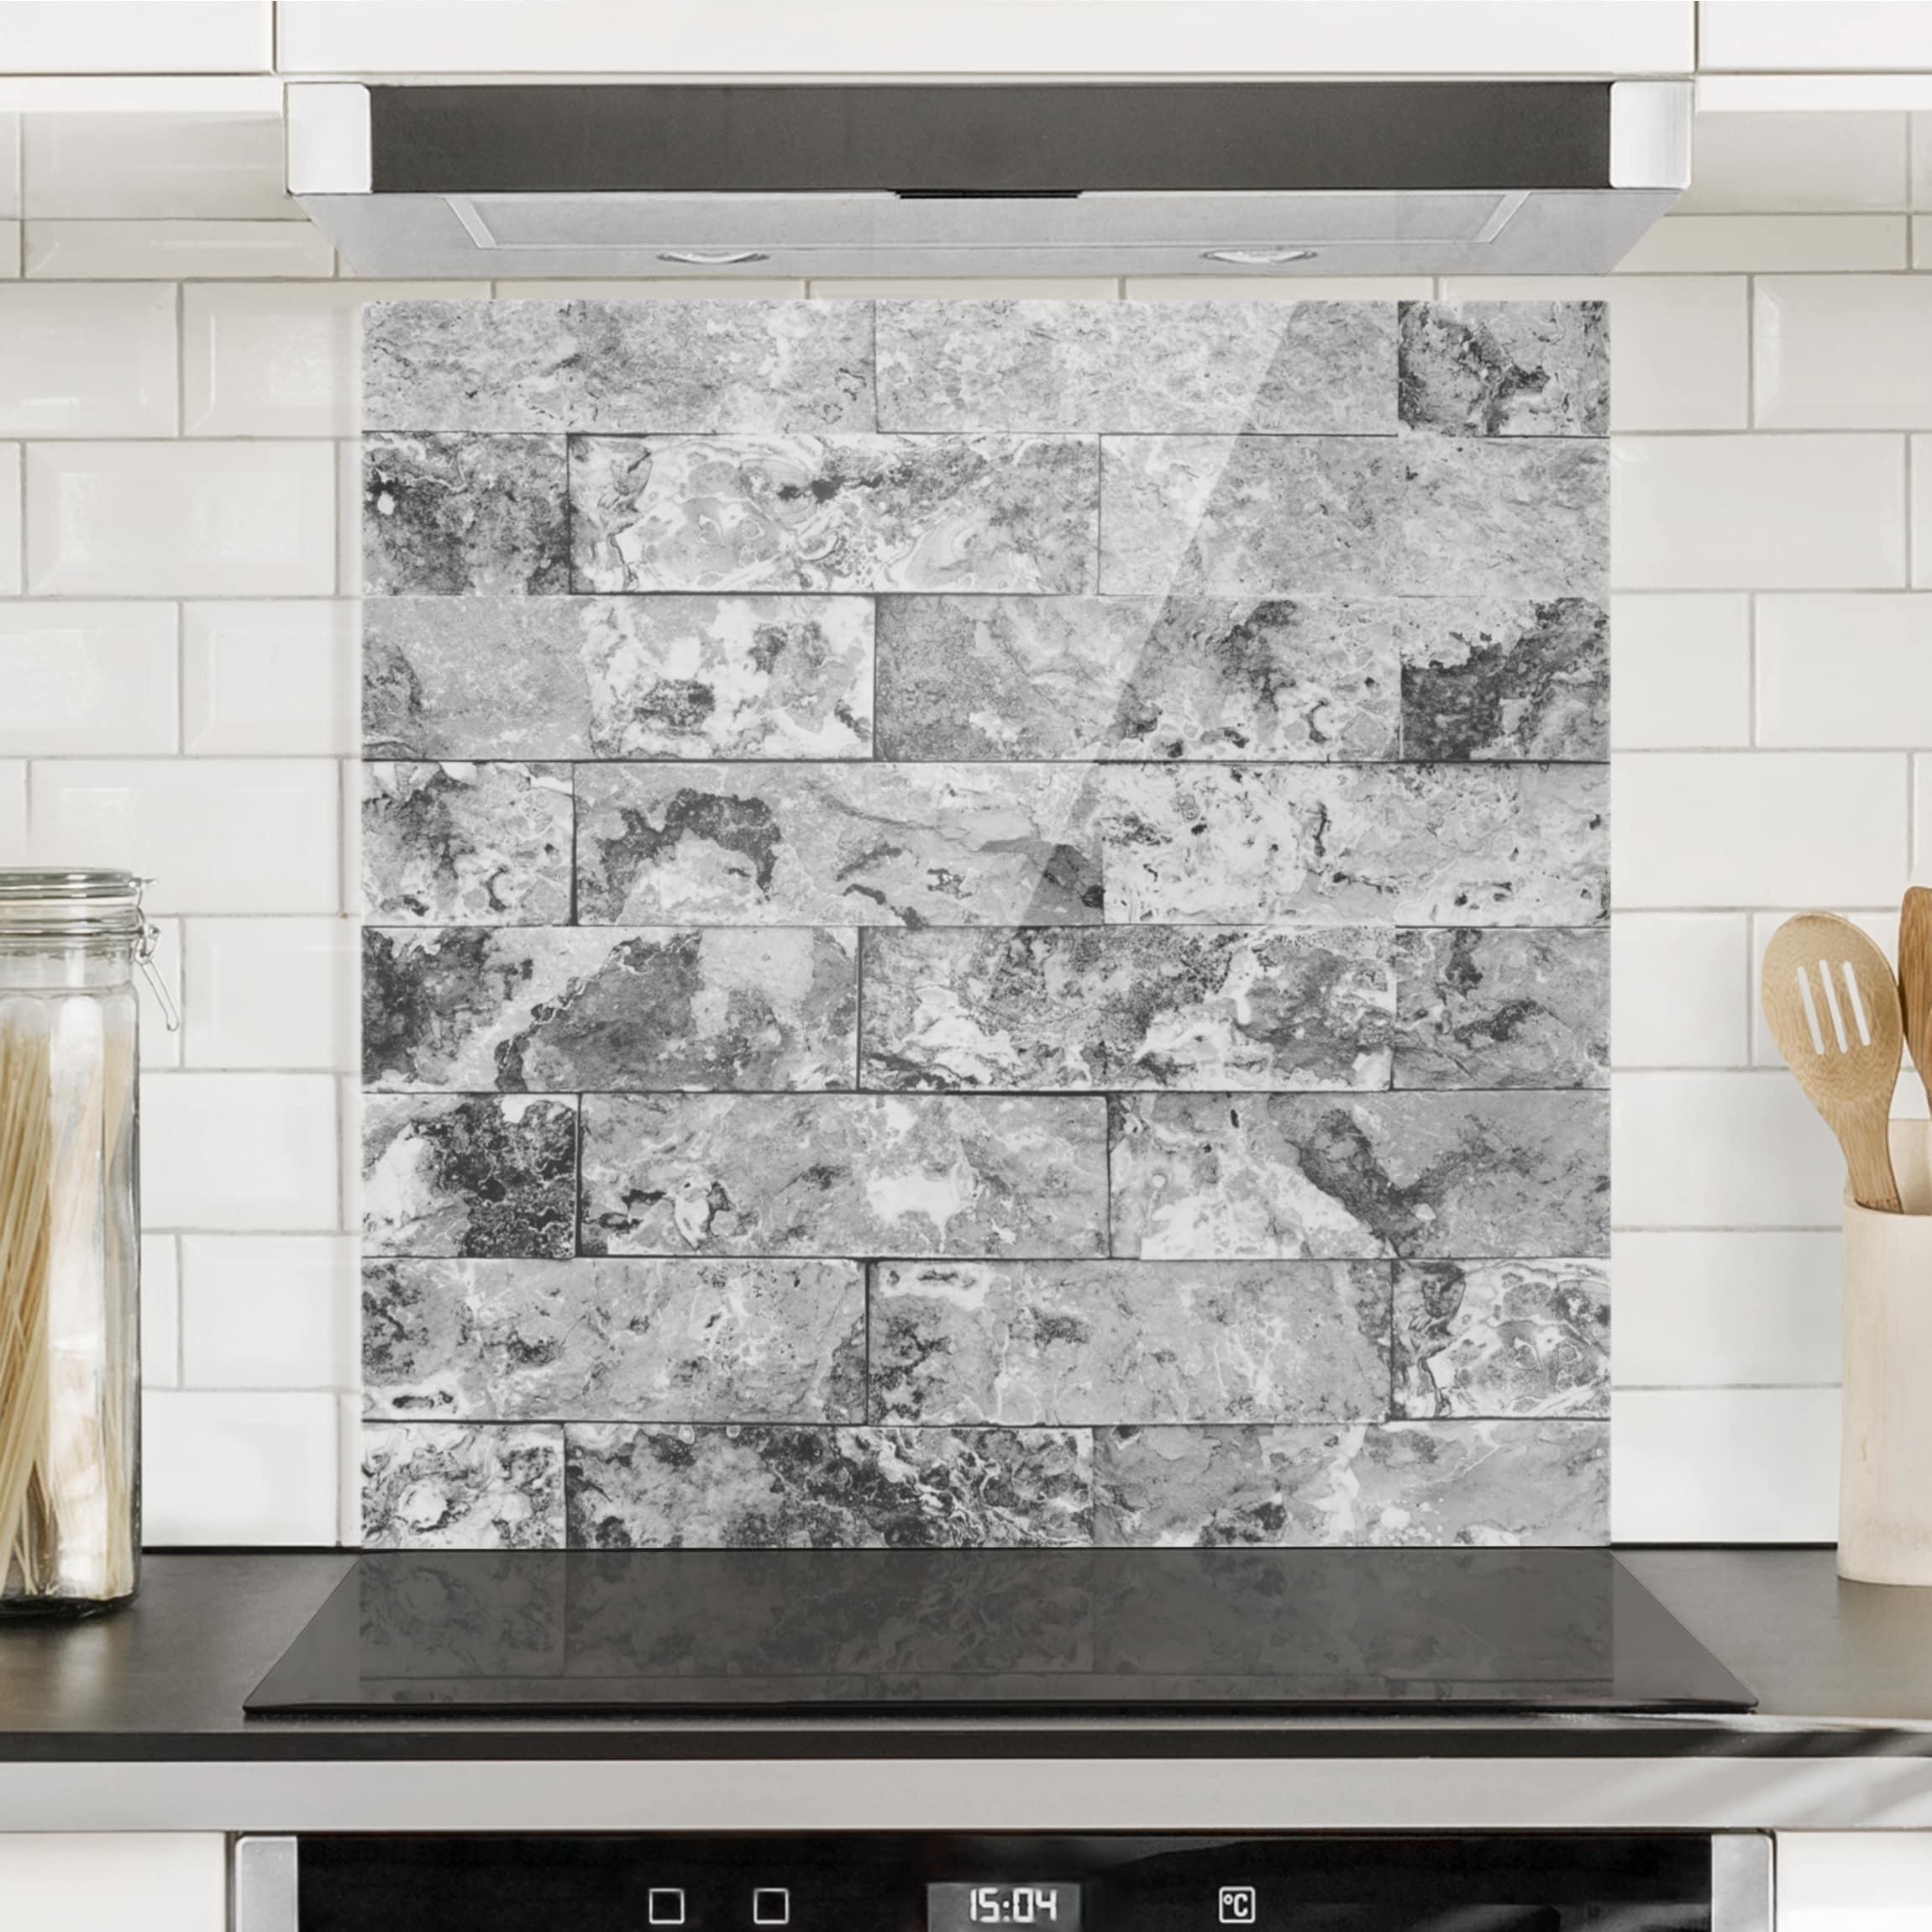 Spritzschutz glas steinwand naturmarmor grau quadrat 1 1 for Spritzschutz glas